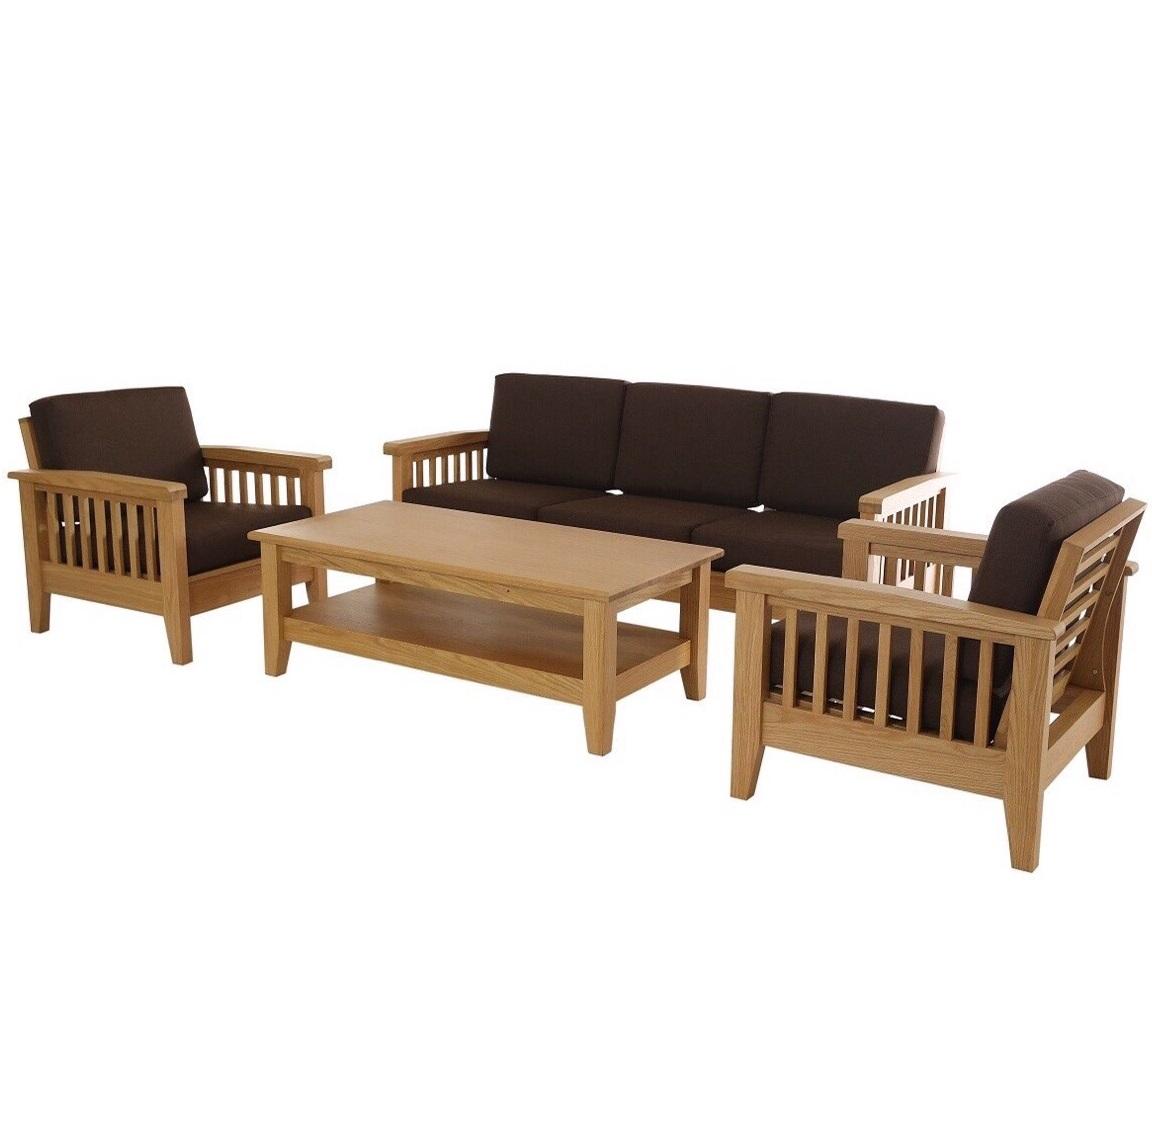 sofa gỗ sồi Mỹ (1)